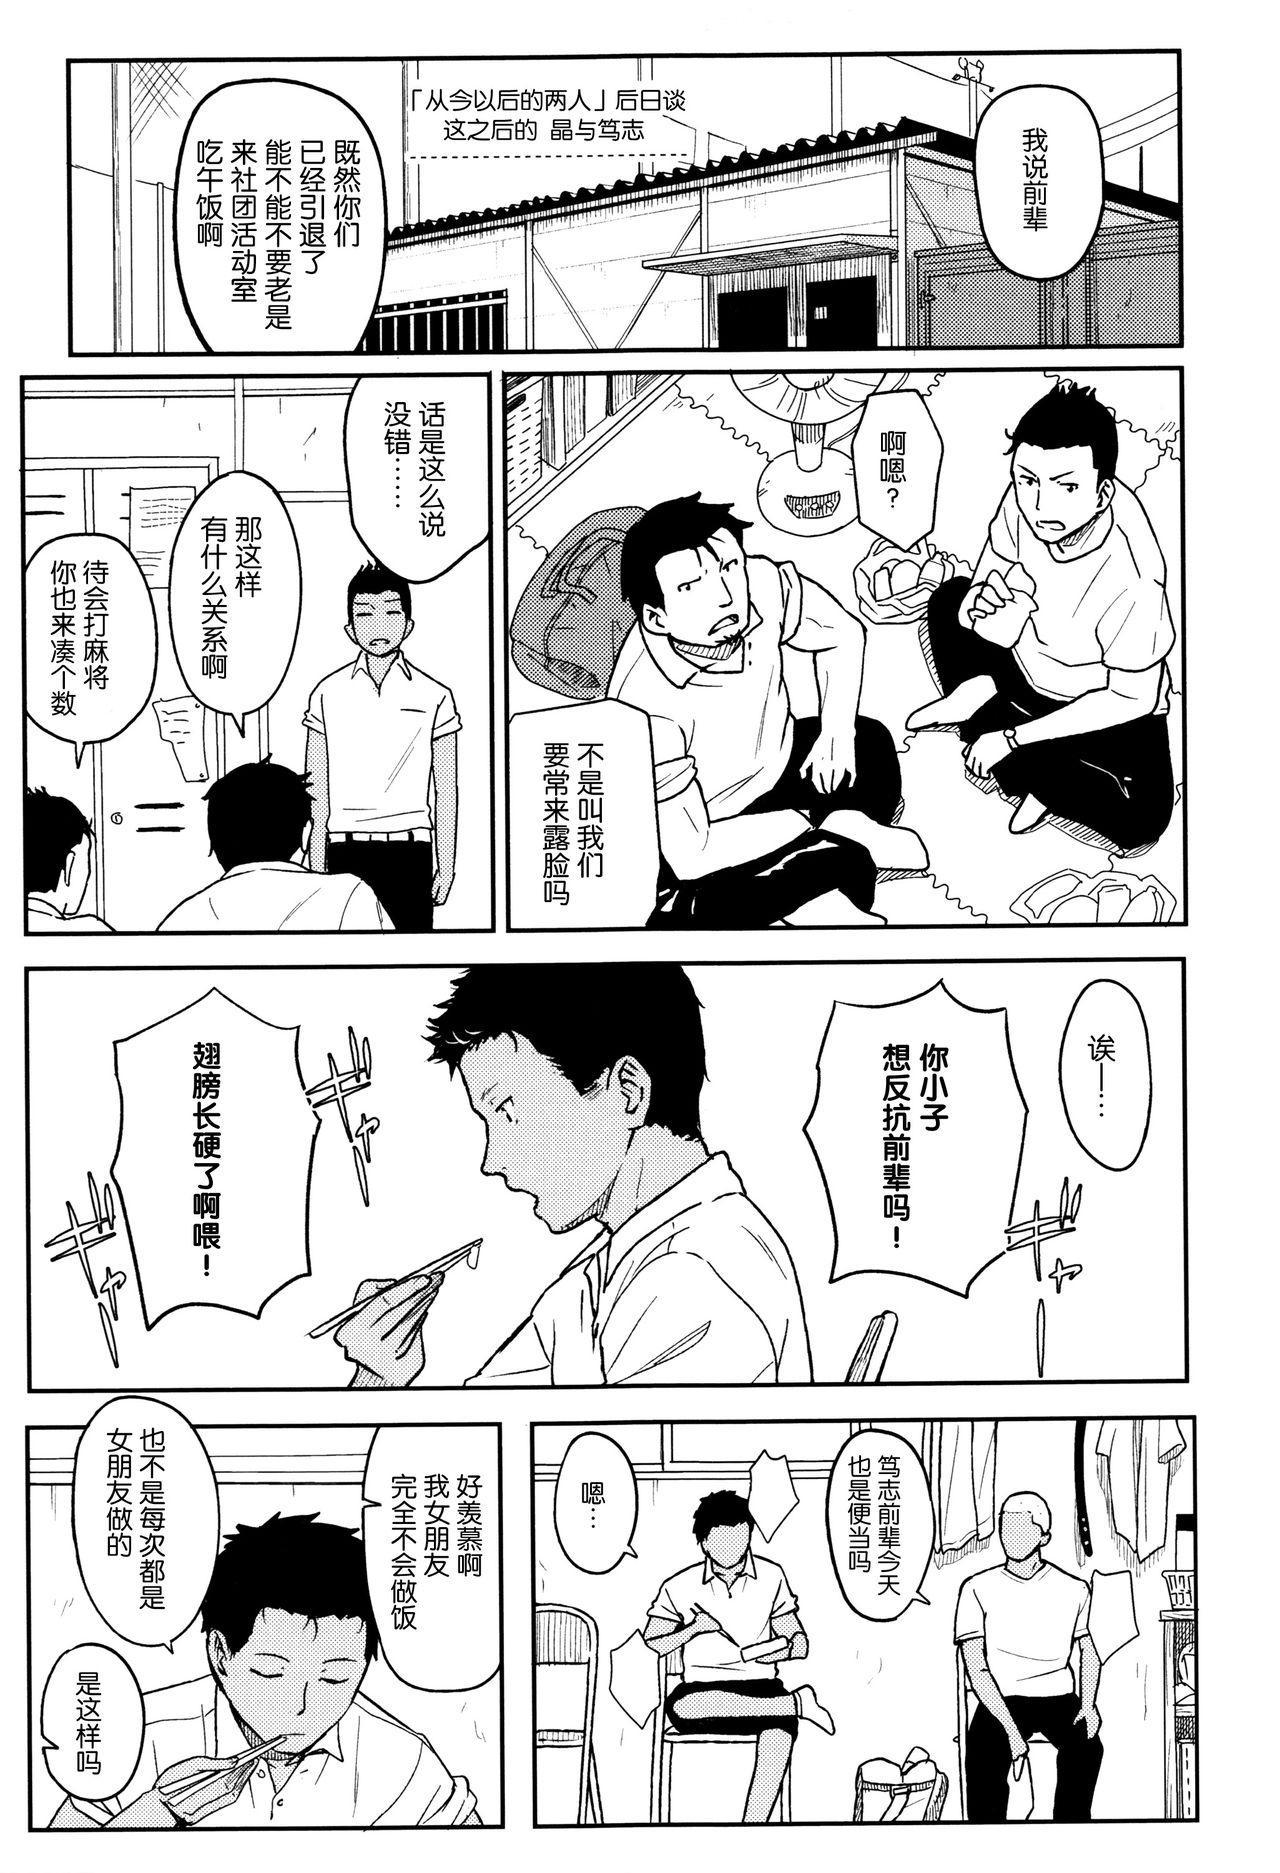 Tokubetsu na Mainichi - Special daily 205